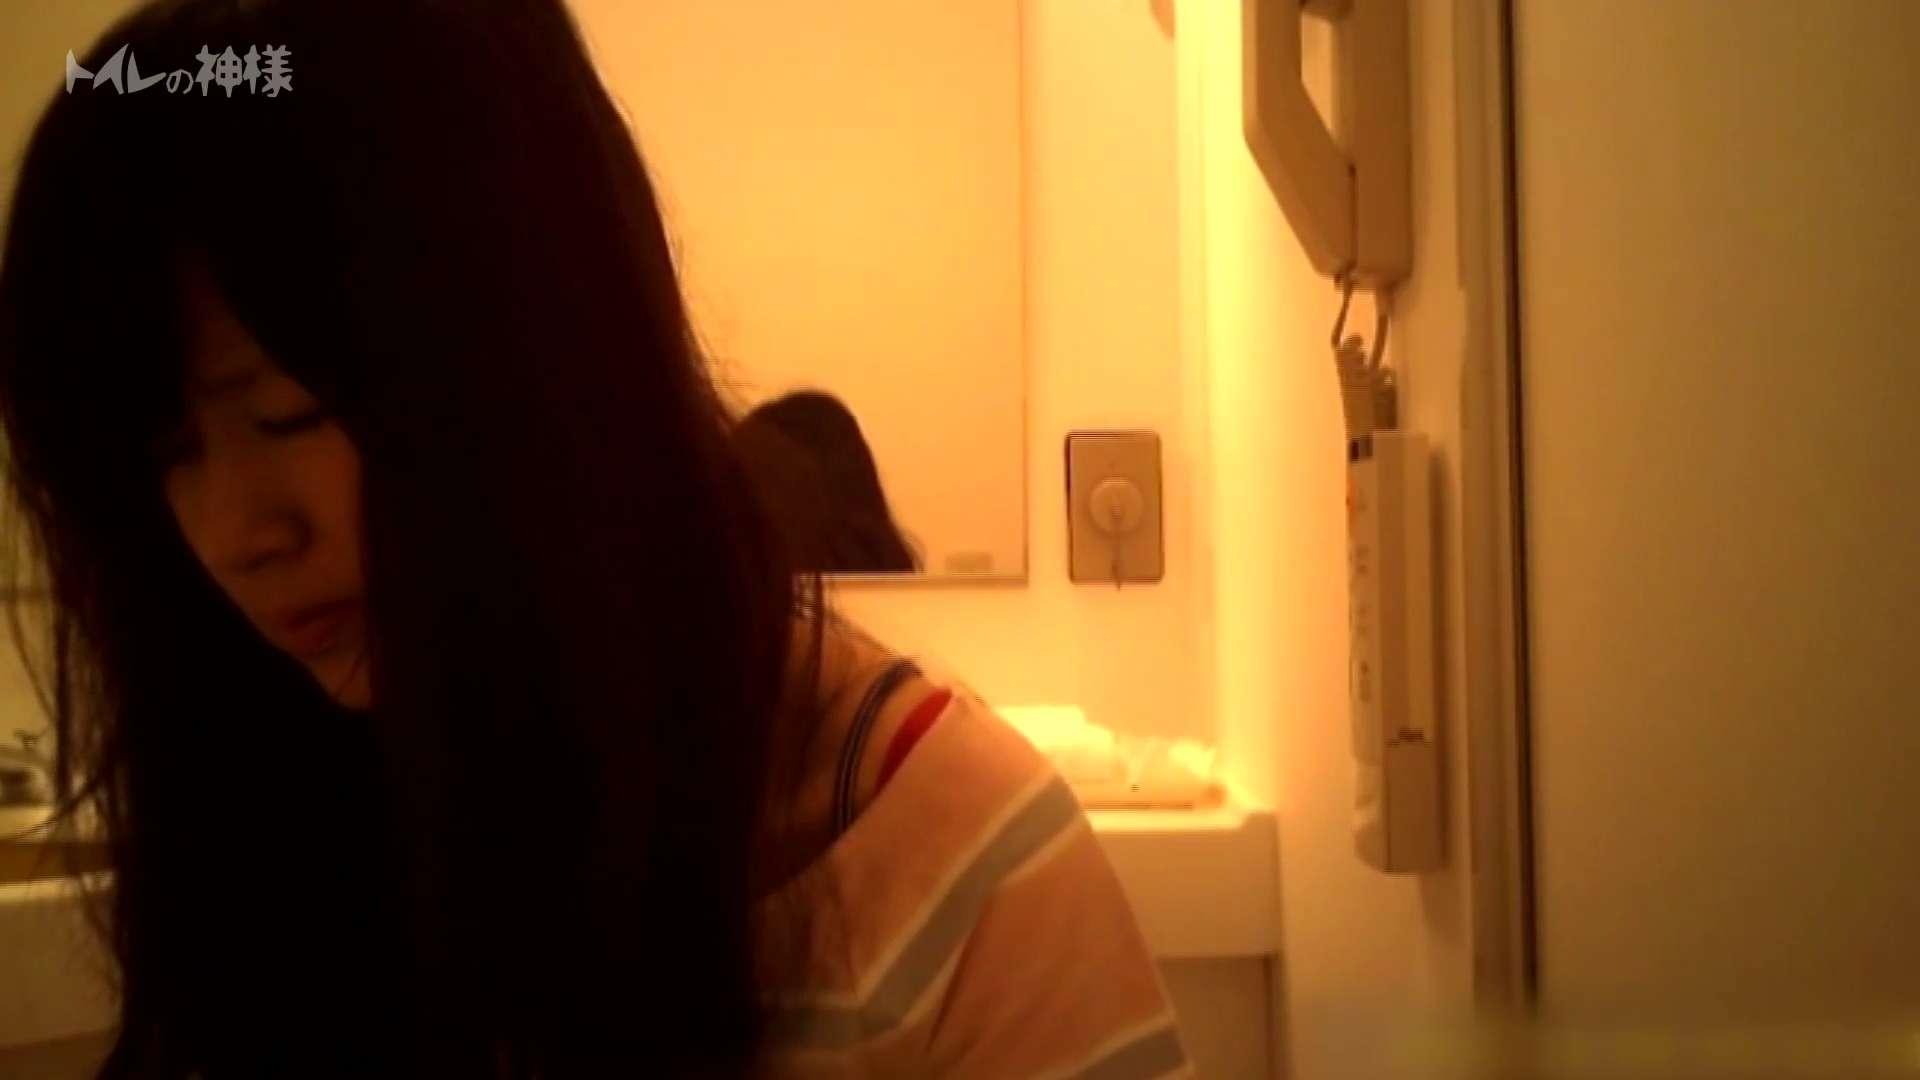 Vol.04 女子大生のトイレ恥態 女子大生 エロ無料画像 92枚 53